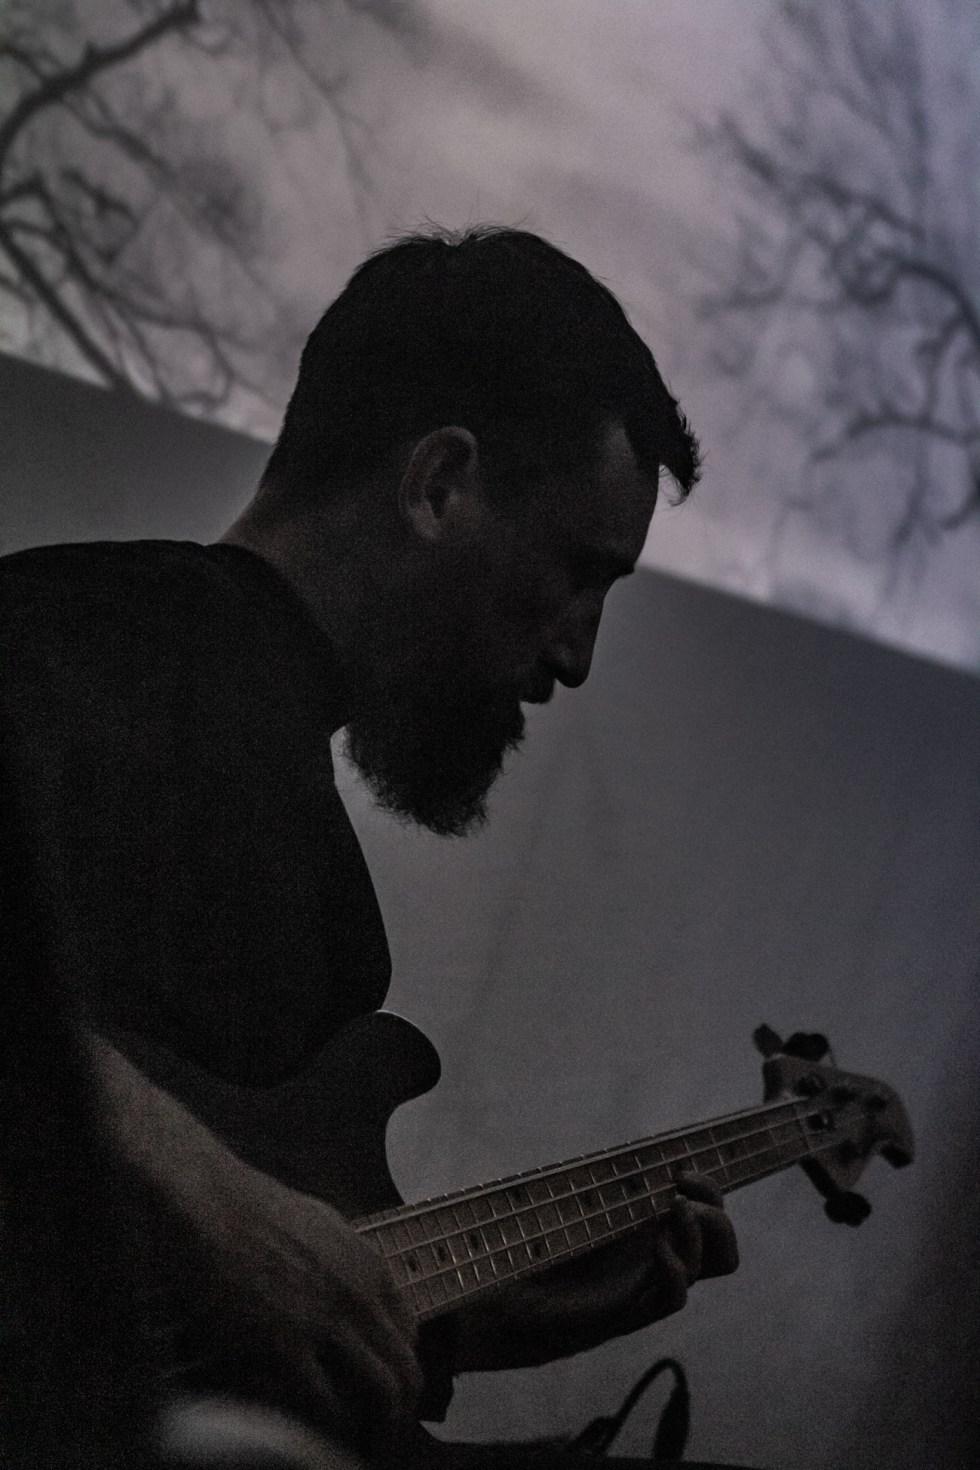 Acoustic Amenra - Bush Hall London - Abi for AN - 02-05-19 (9 of 26)